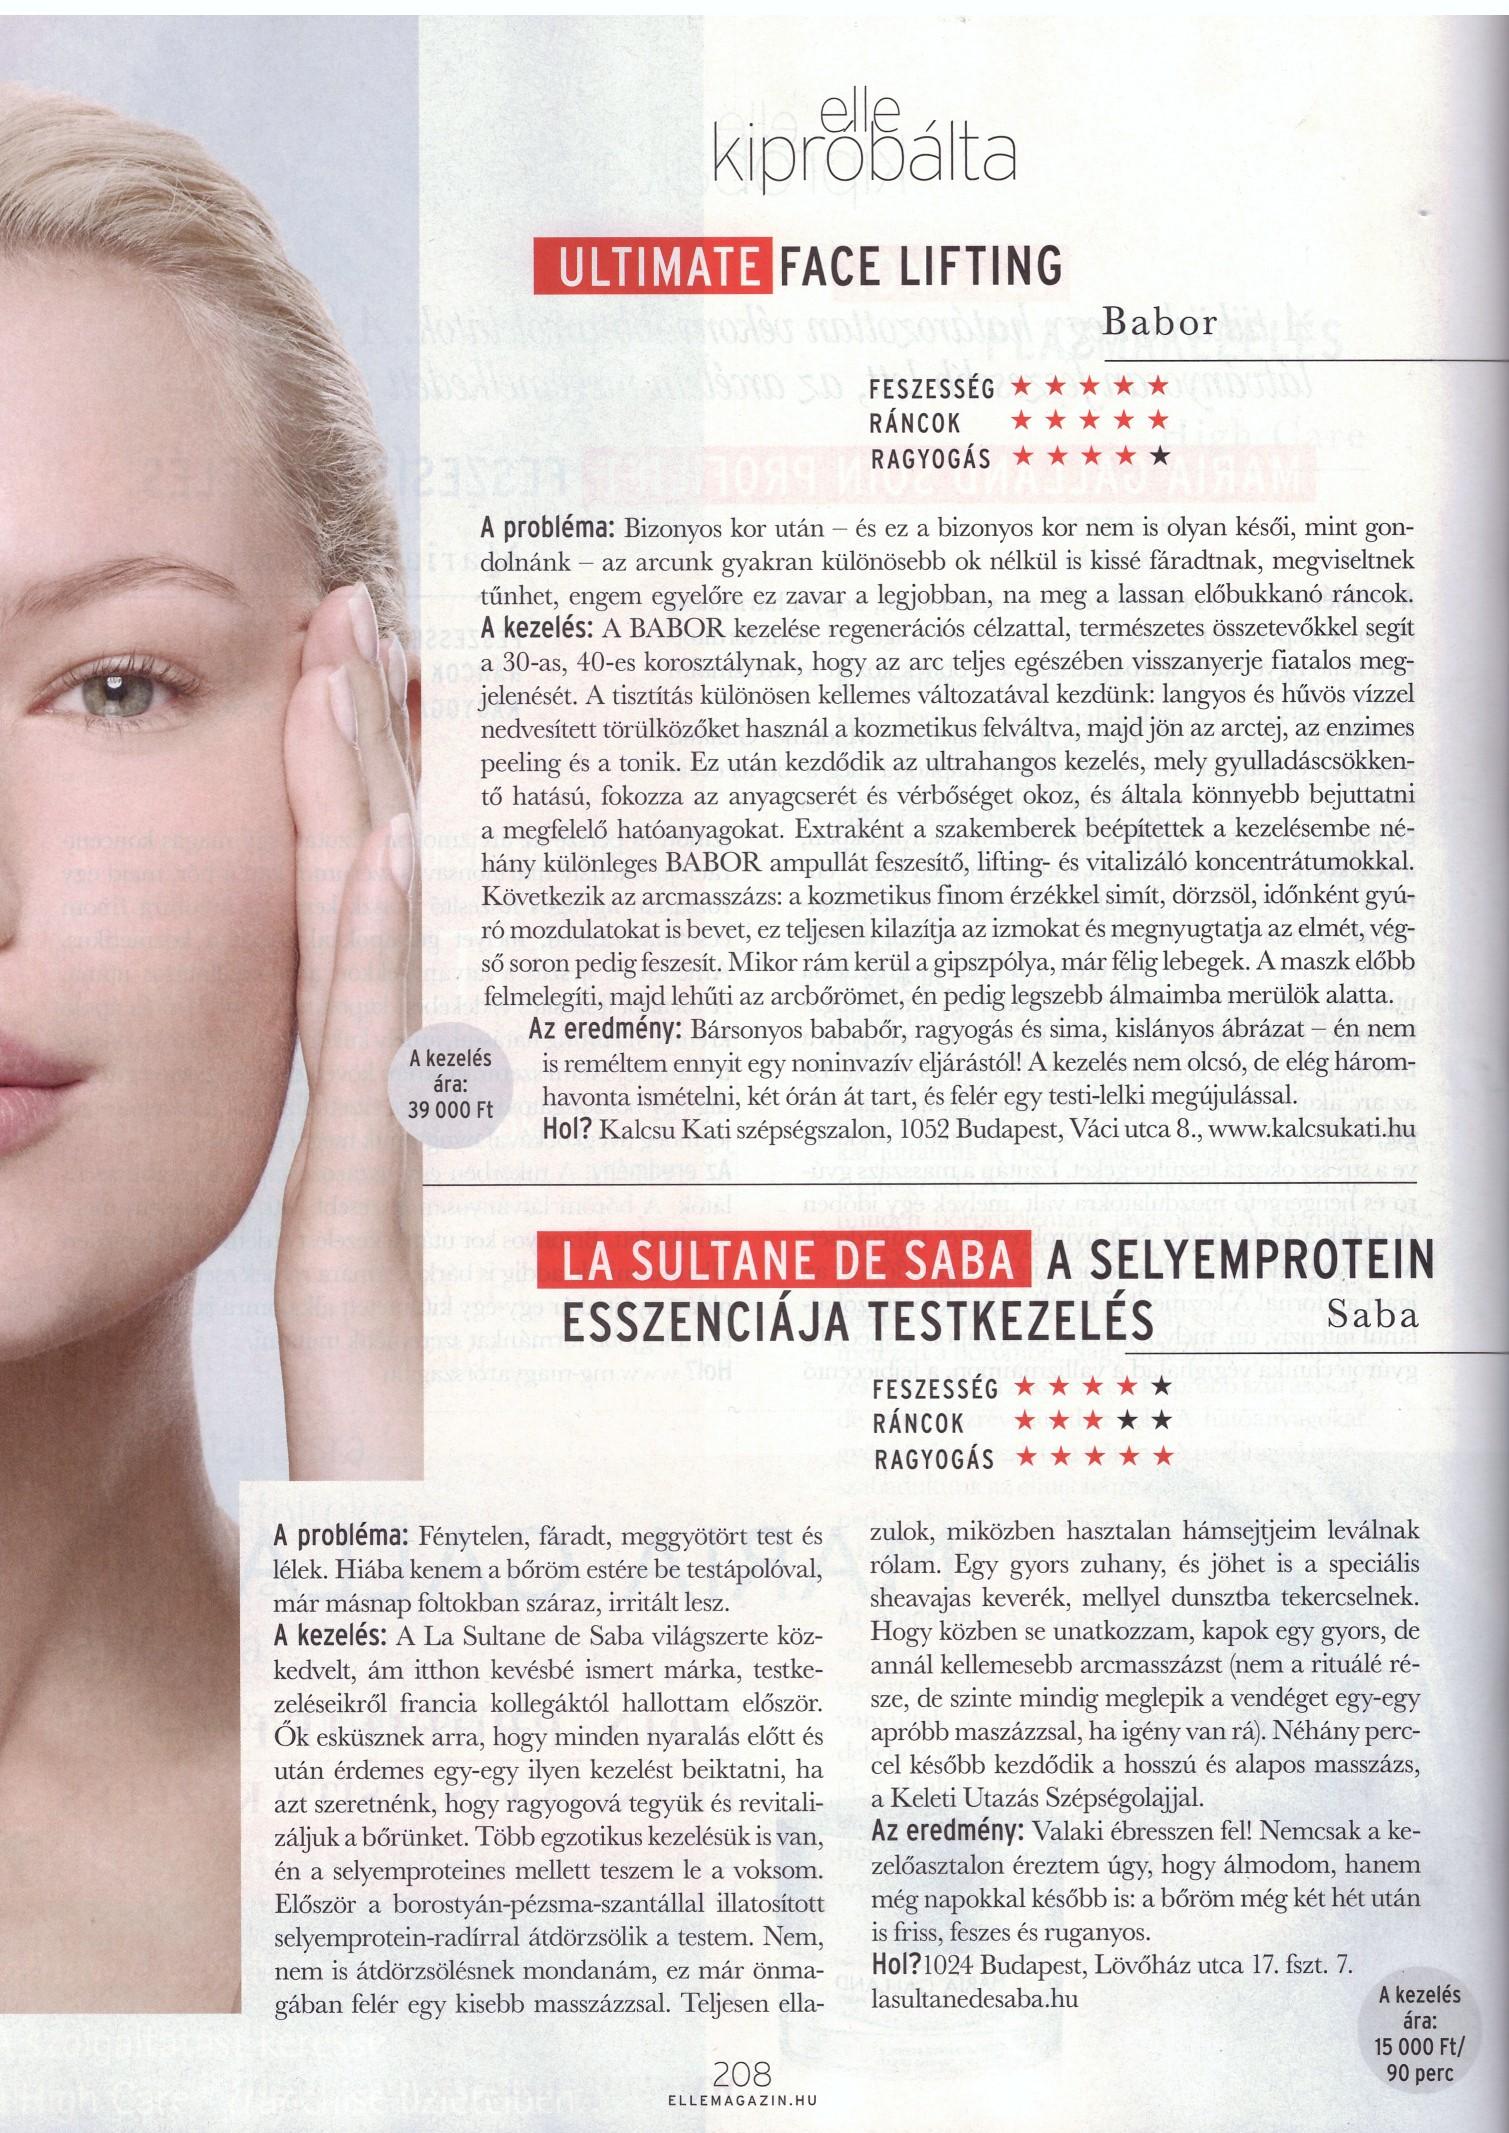 Elle Silk Protein Article Nov 2017